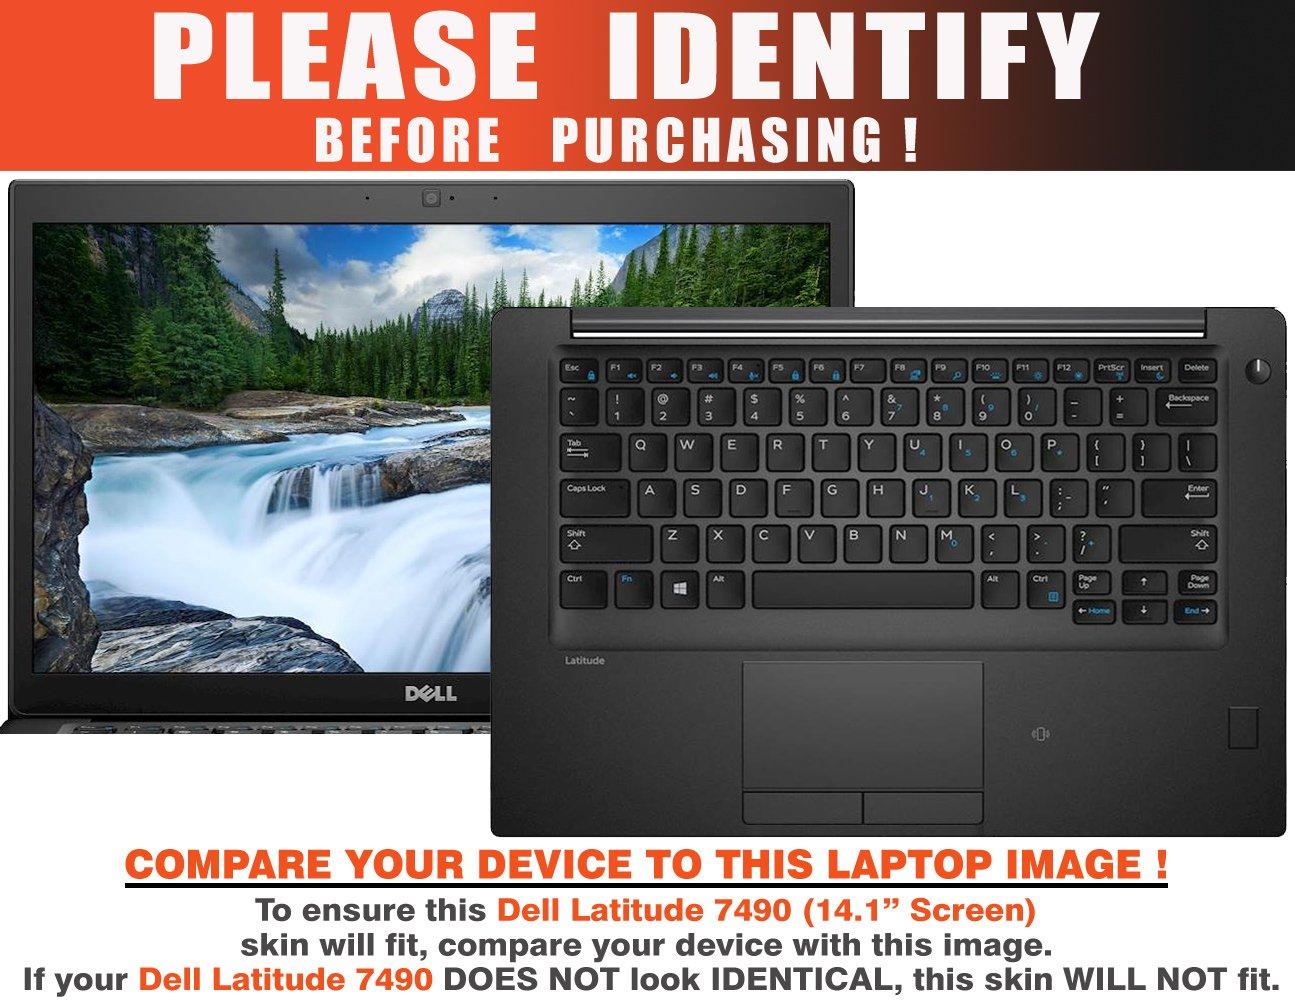 decalrus Protective Decal Patriotic Skin Sticker for Dell Latitude 7490 (14'' Screen) case cover wrap DElatitude7490-192 by decalrus (Image #2)